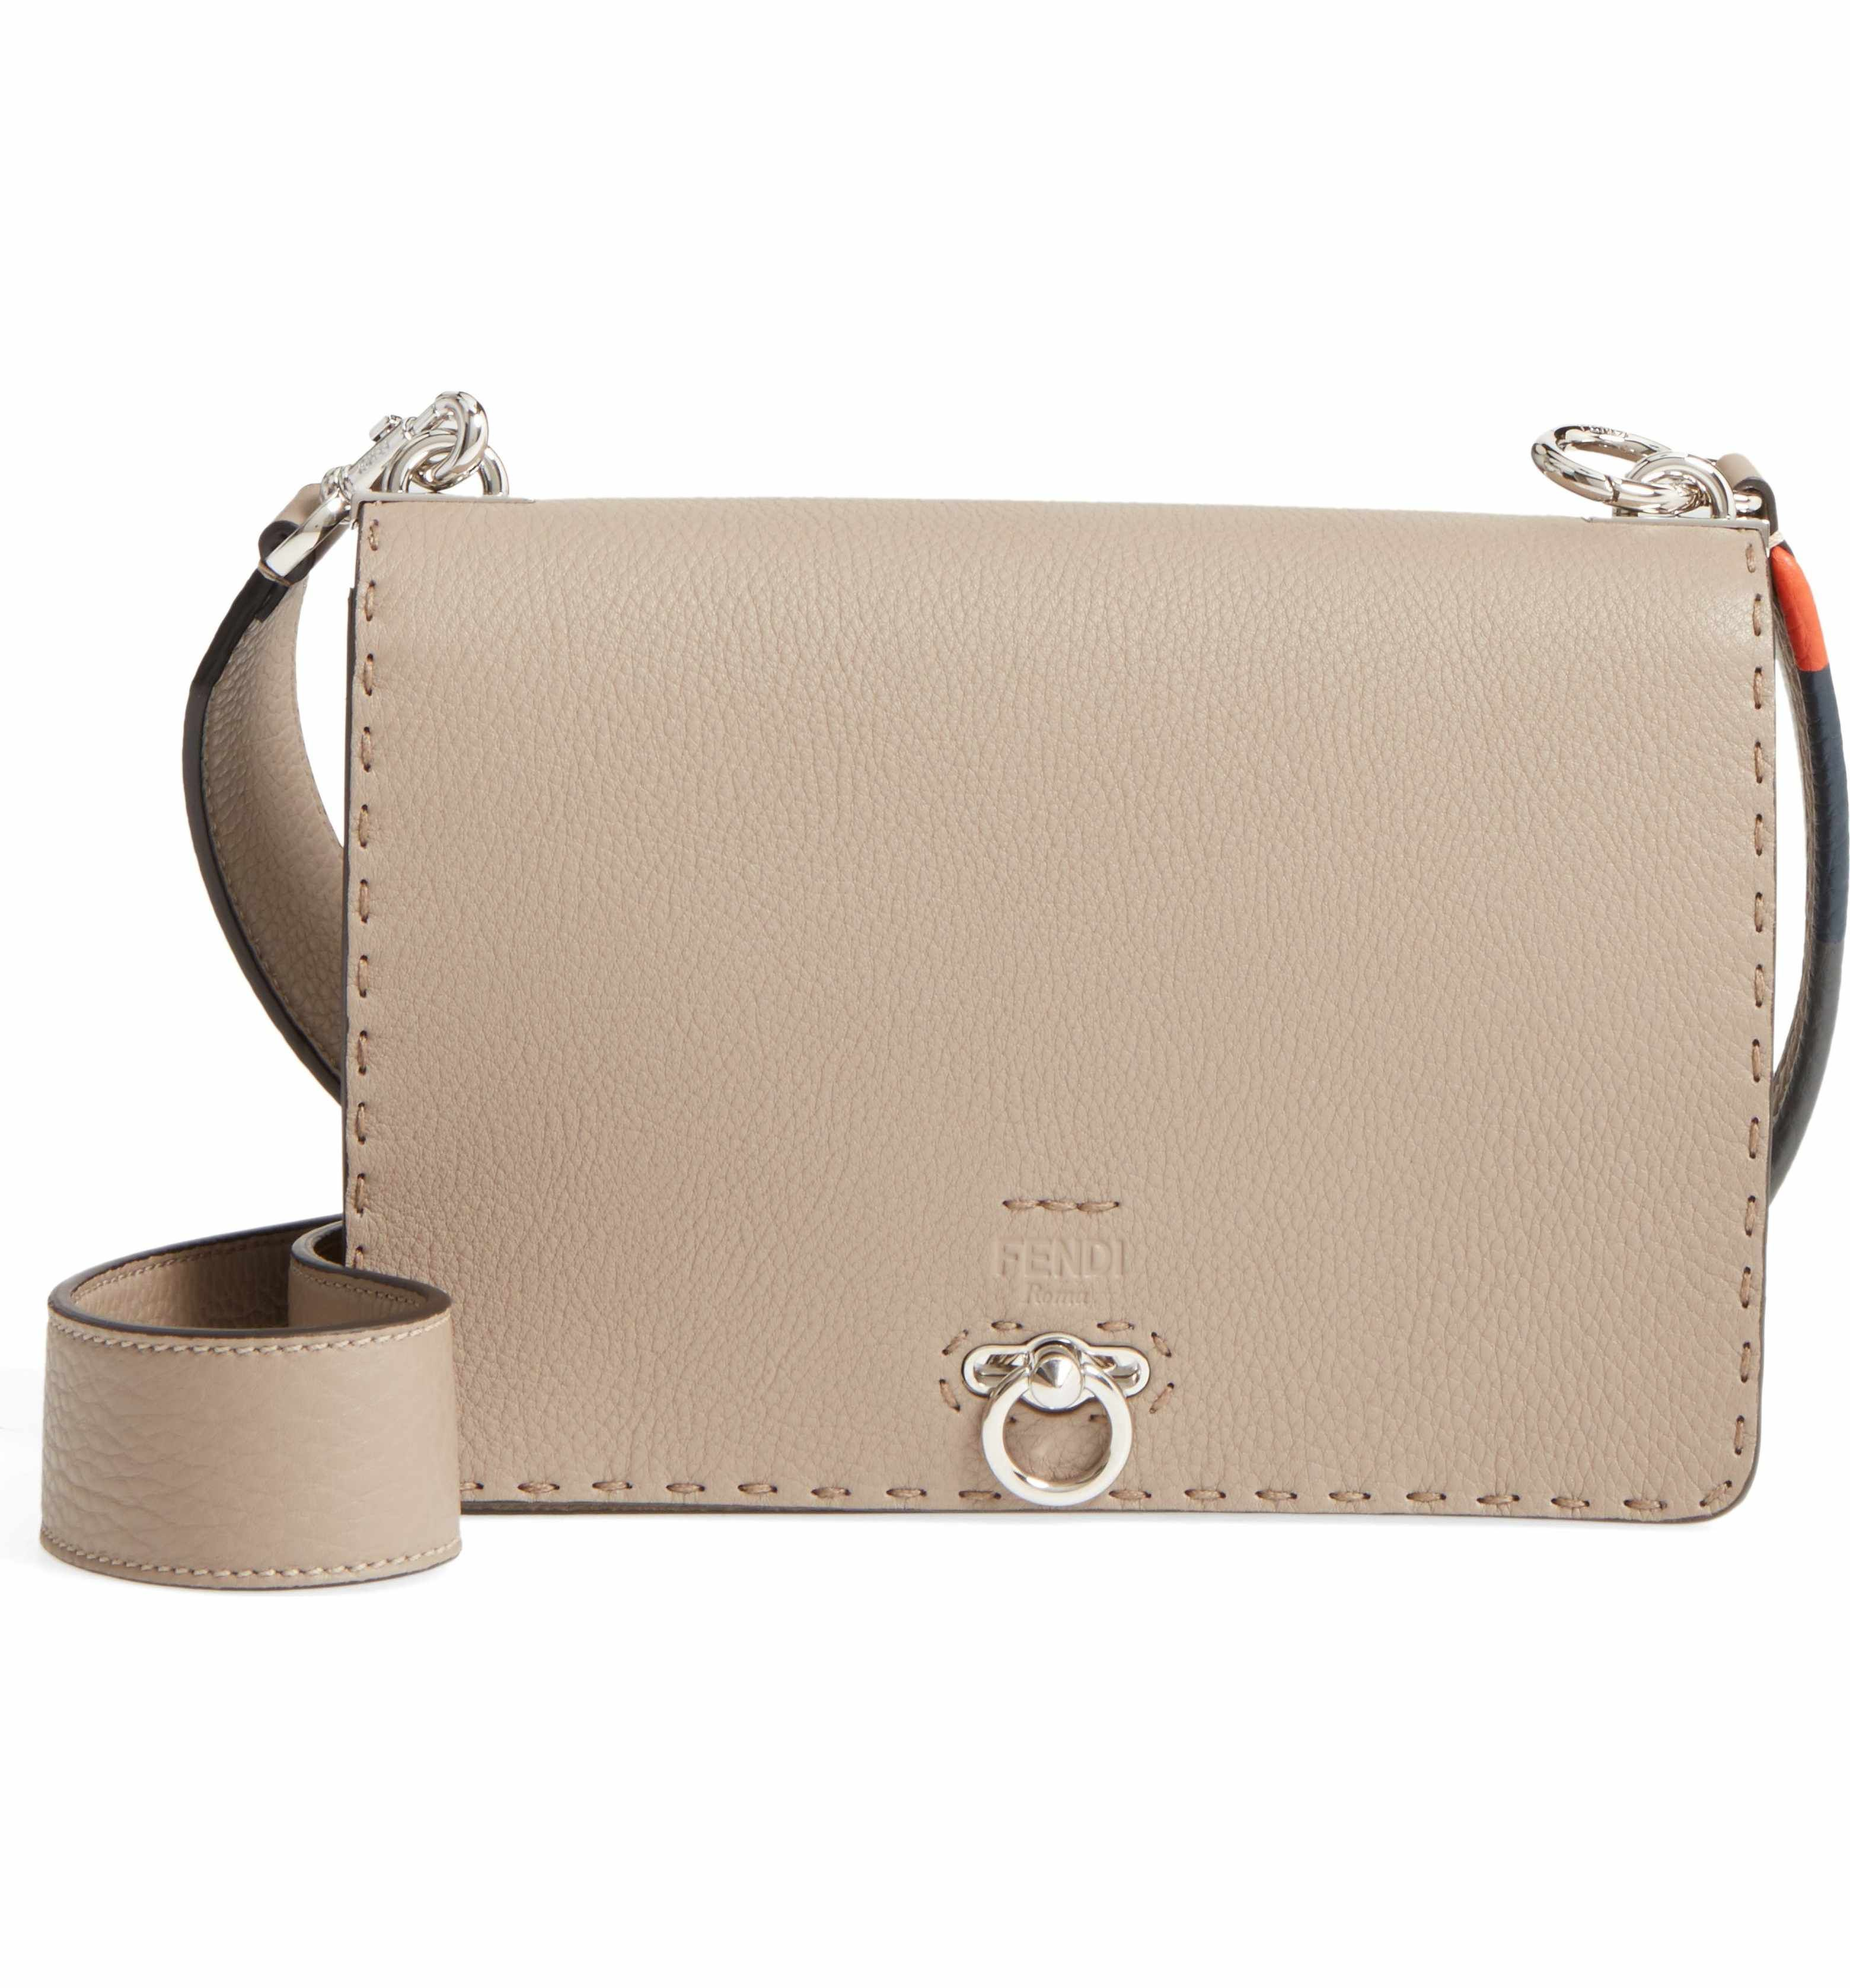 Fendi Pebbled Leather Messenger Bag  de9bad95a722a